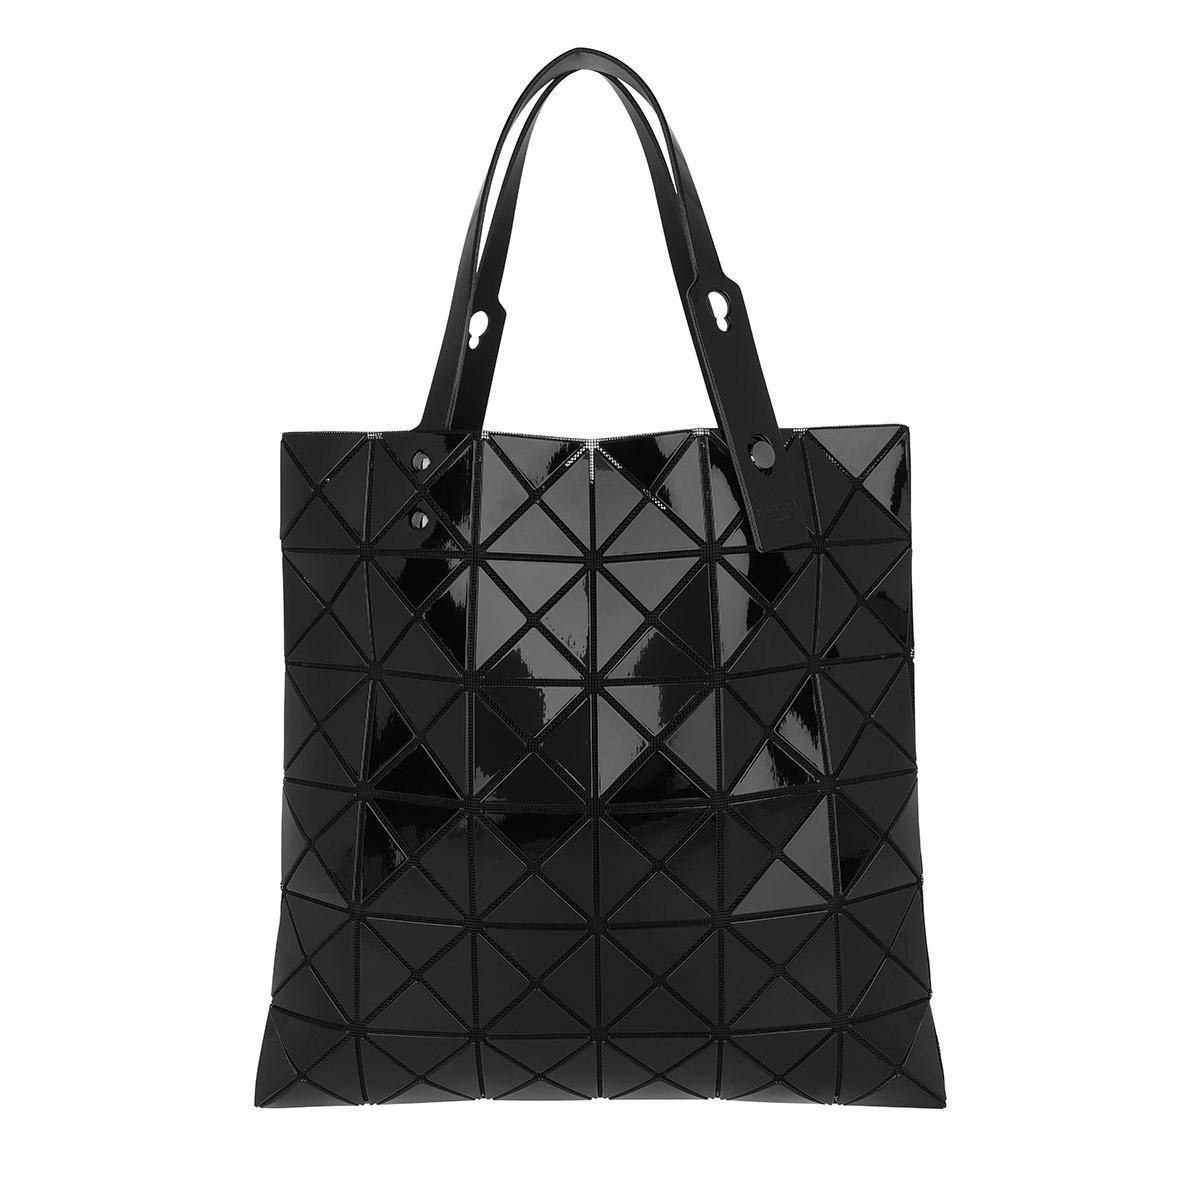 f3ed5d850a Bao Bao Issey Miyake Handle Bag Black in Black - Lyst